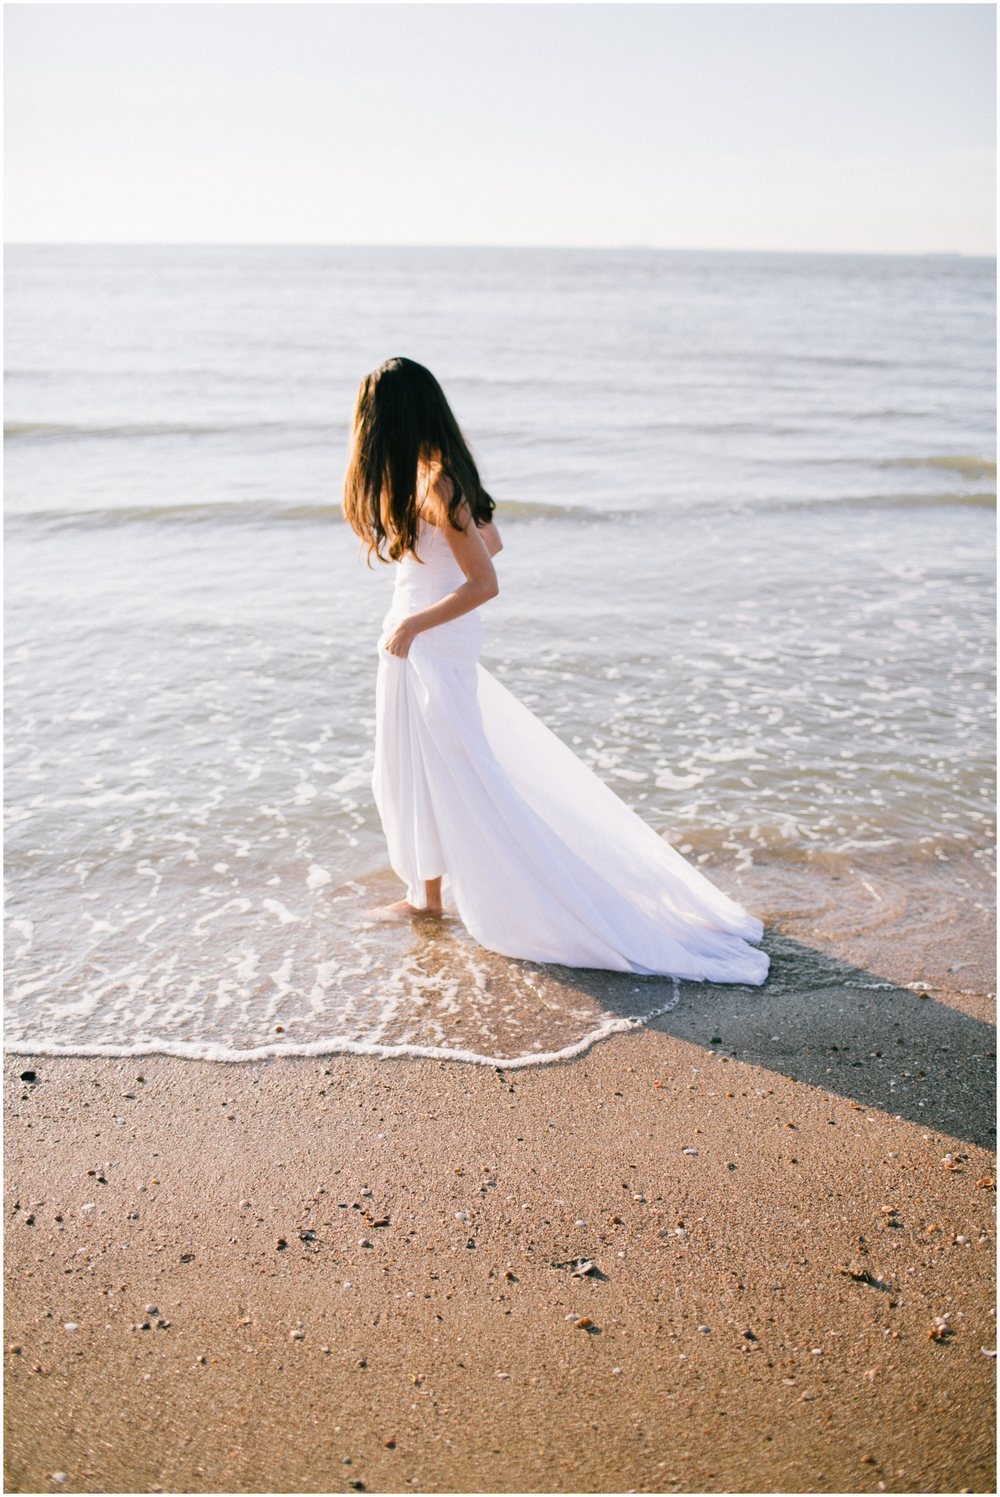 Unielle Couture dress